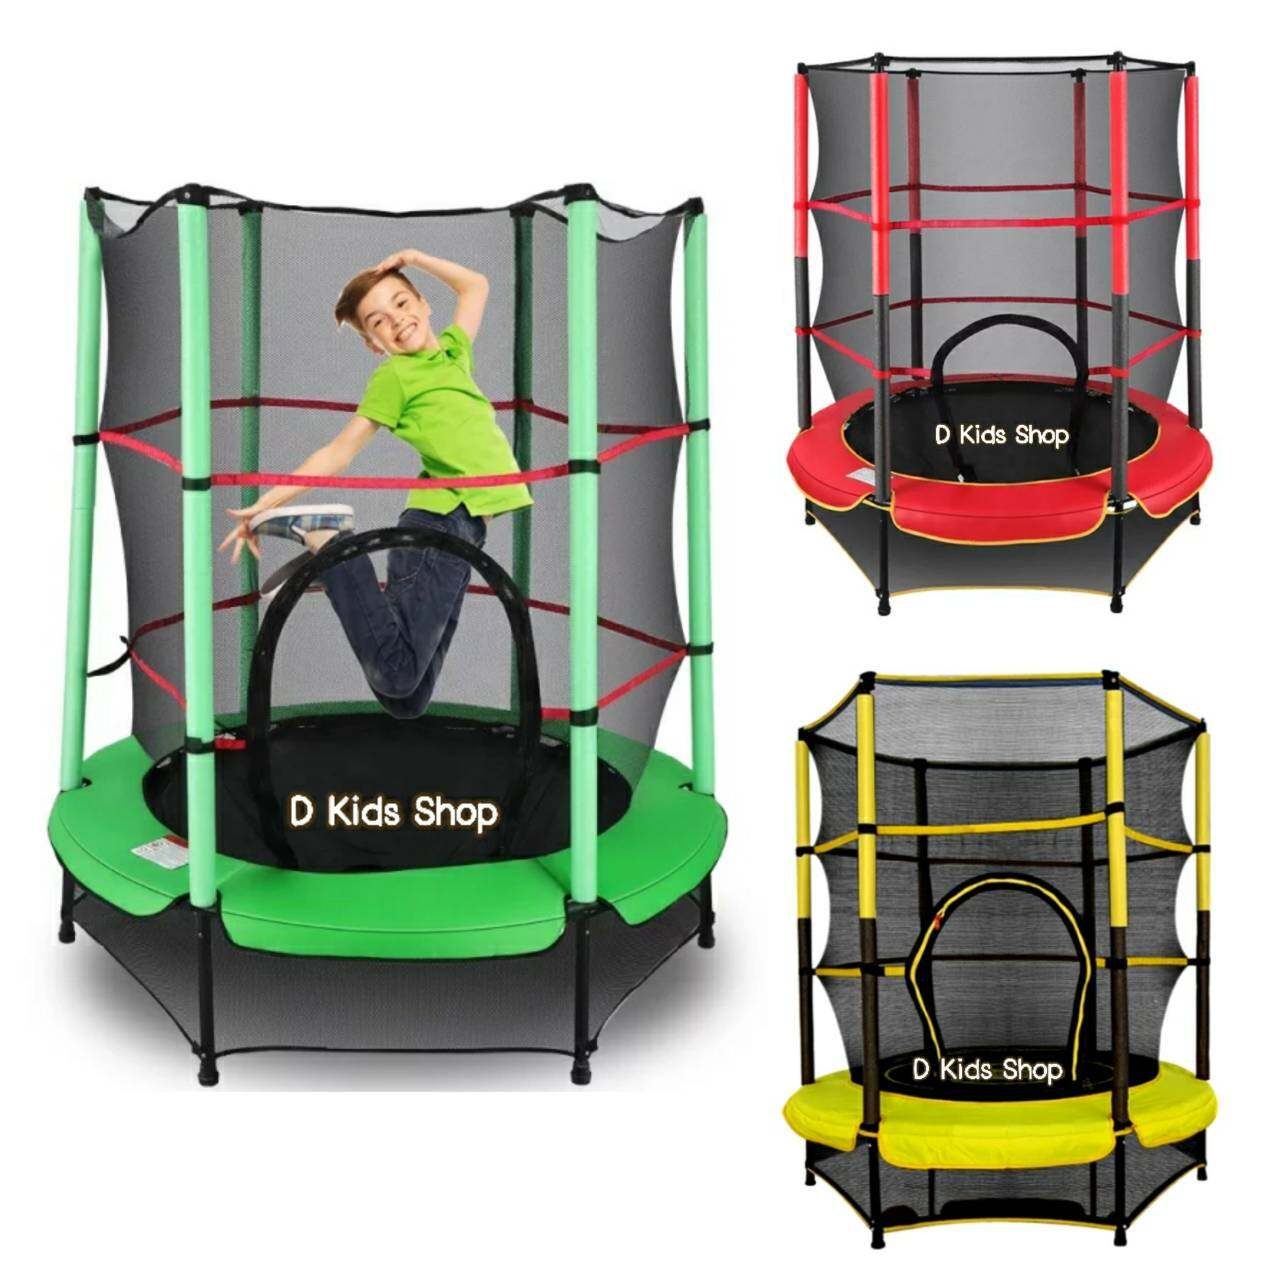 D Kids แทรมโพลีนสำหรับเด็กกระโดดเล่น หรือออกกำลังกาย ขนาด 140 X 165 Cm. Trampoline Jump.